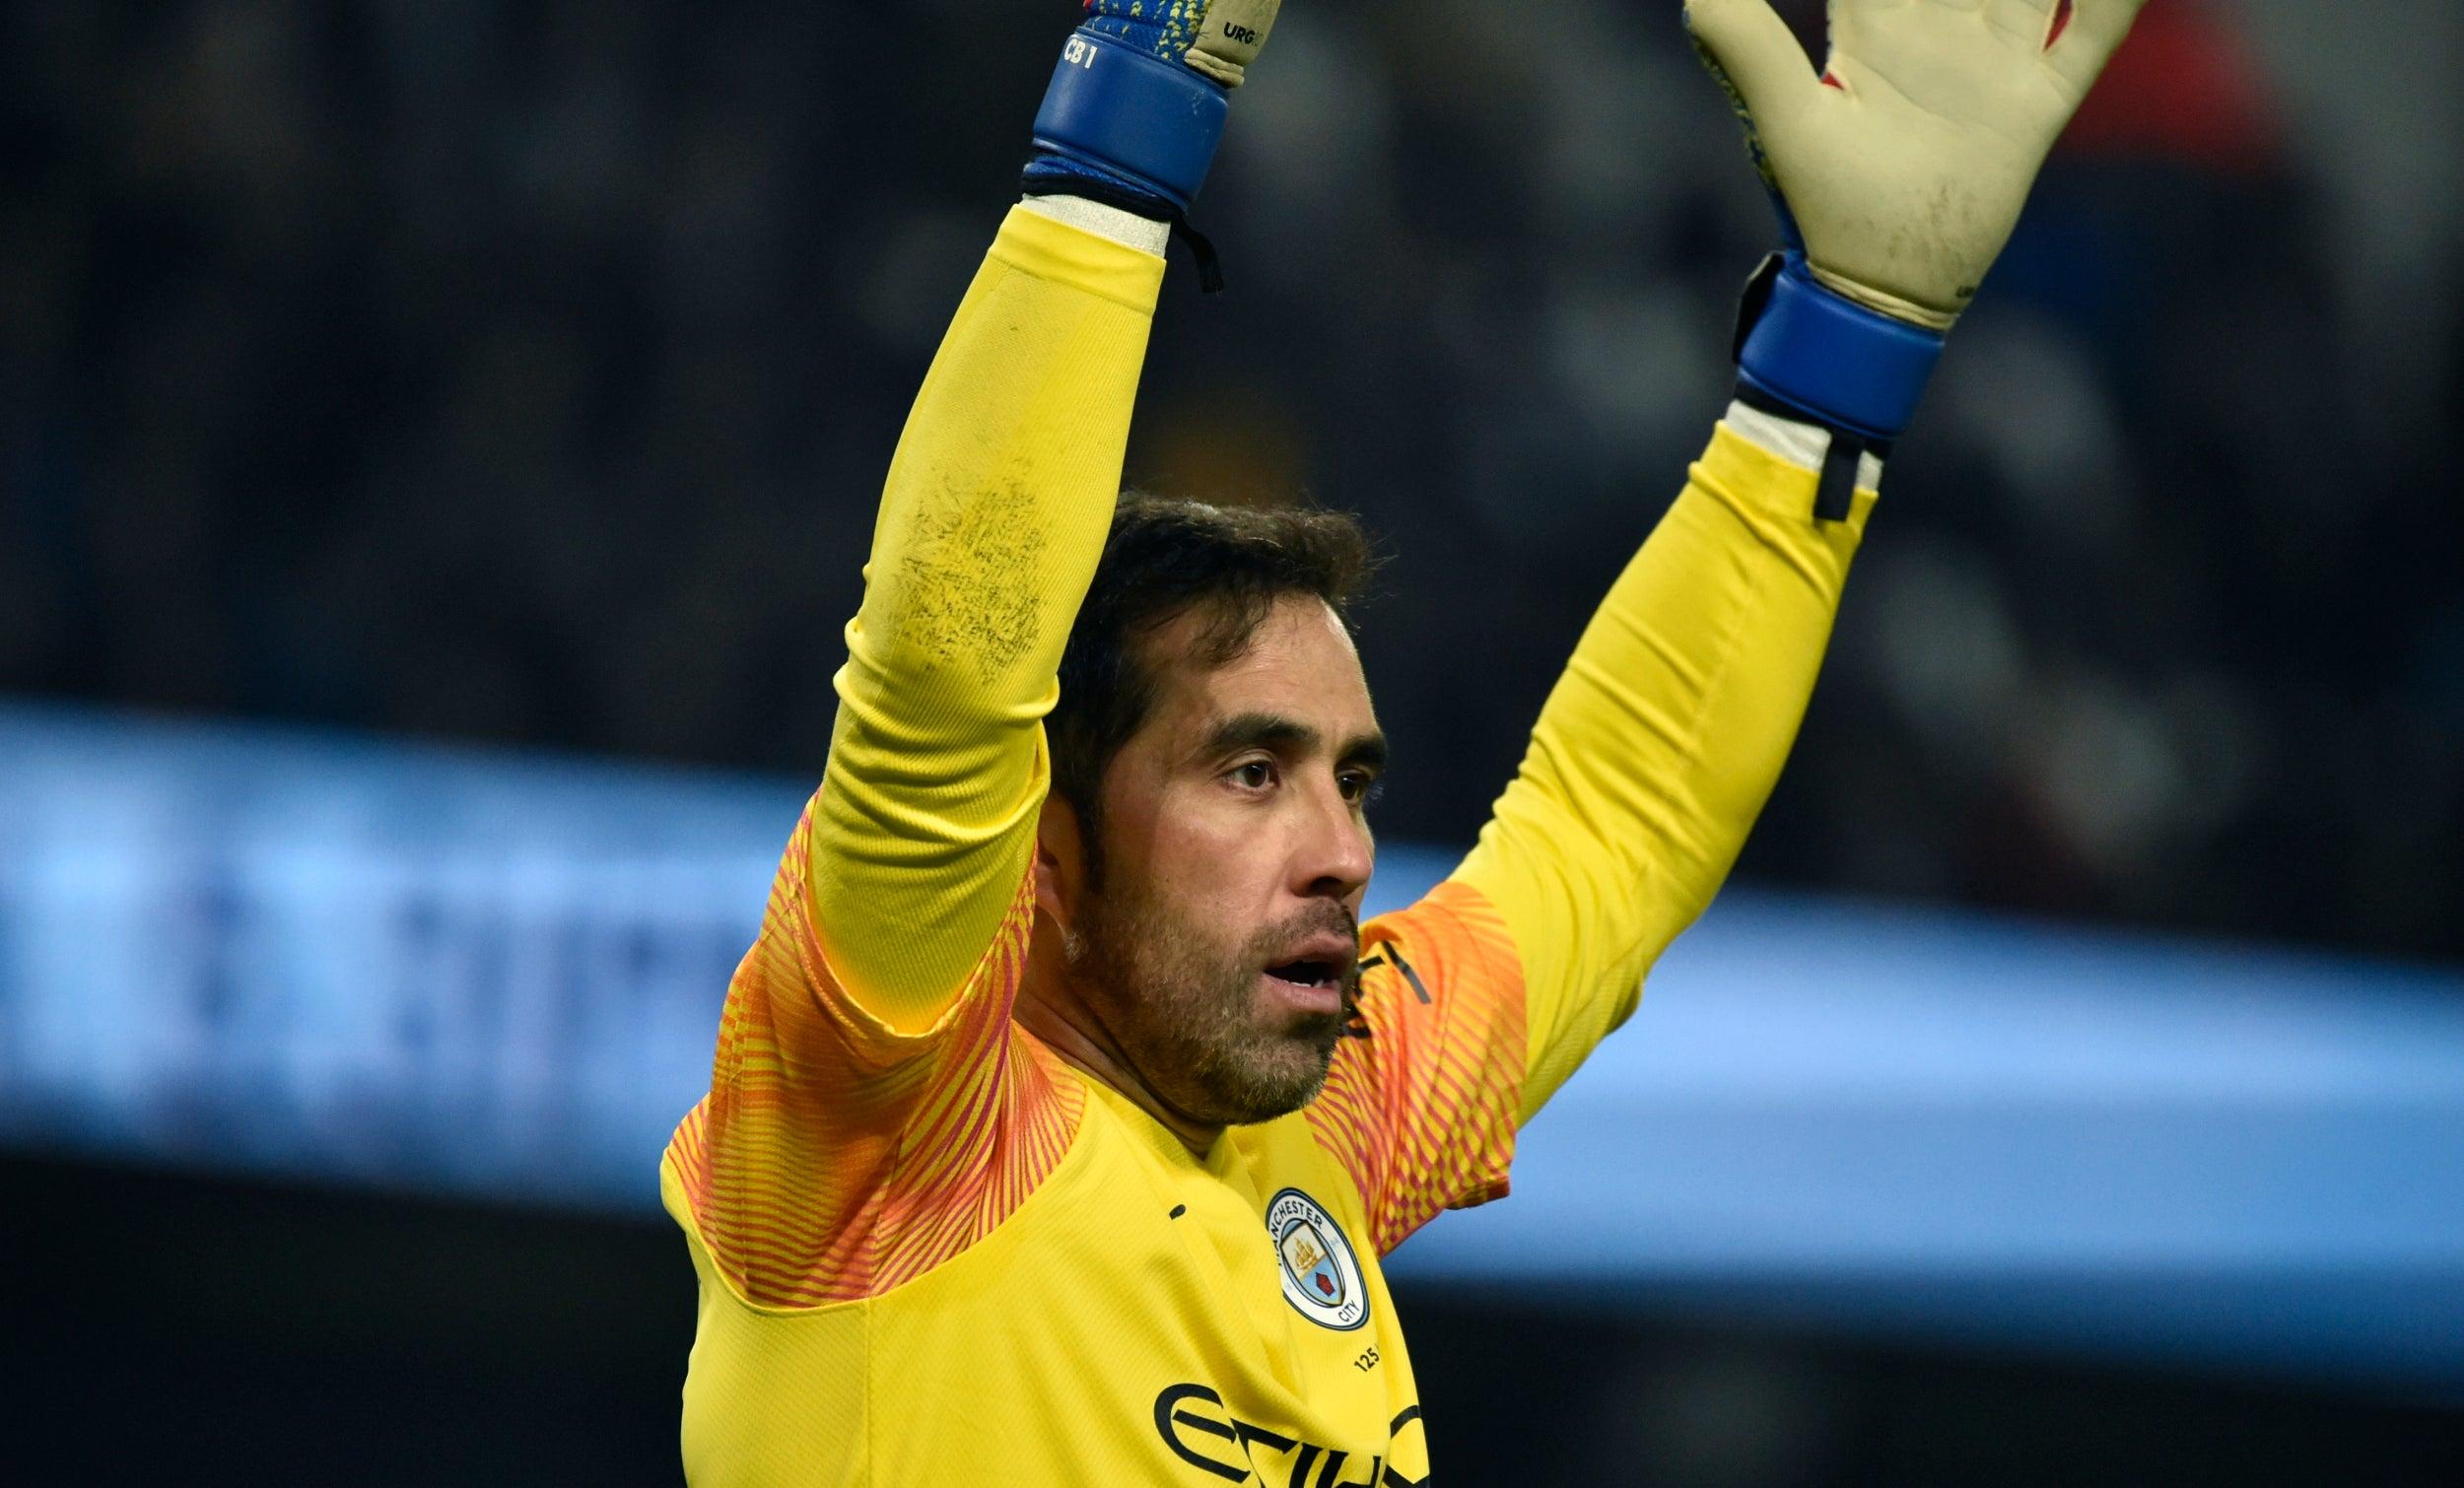 Man City vs Everton, player ratings: Gabriel Jesus and ...